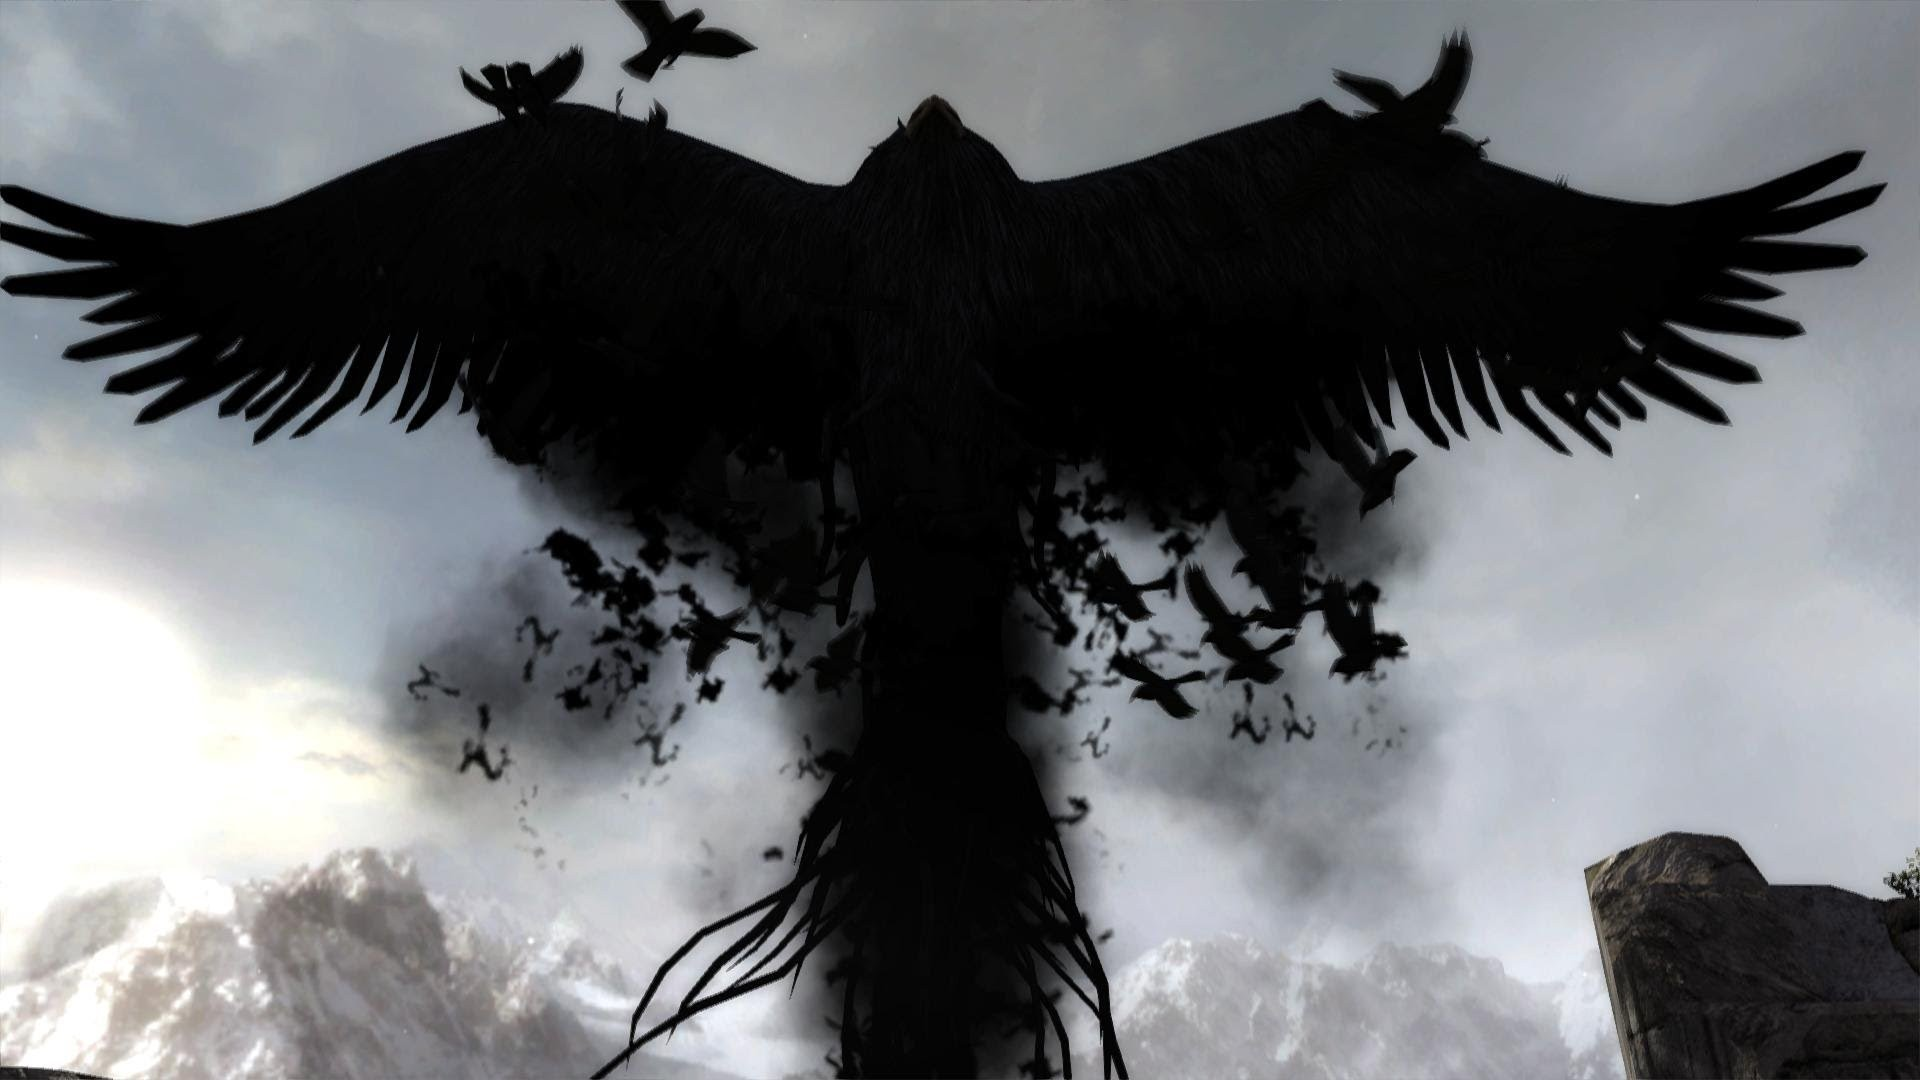 Crow Wallpaper Download Free Backgrounds For Desktop Mobile